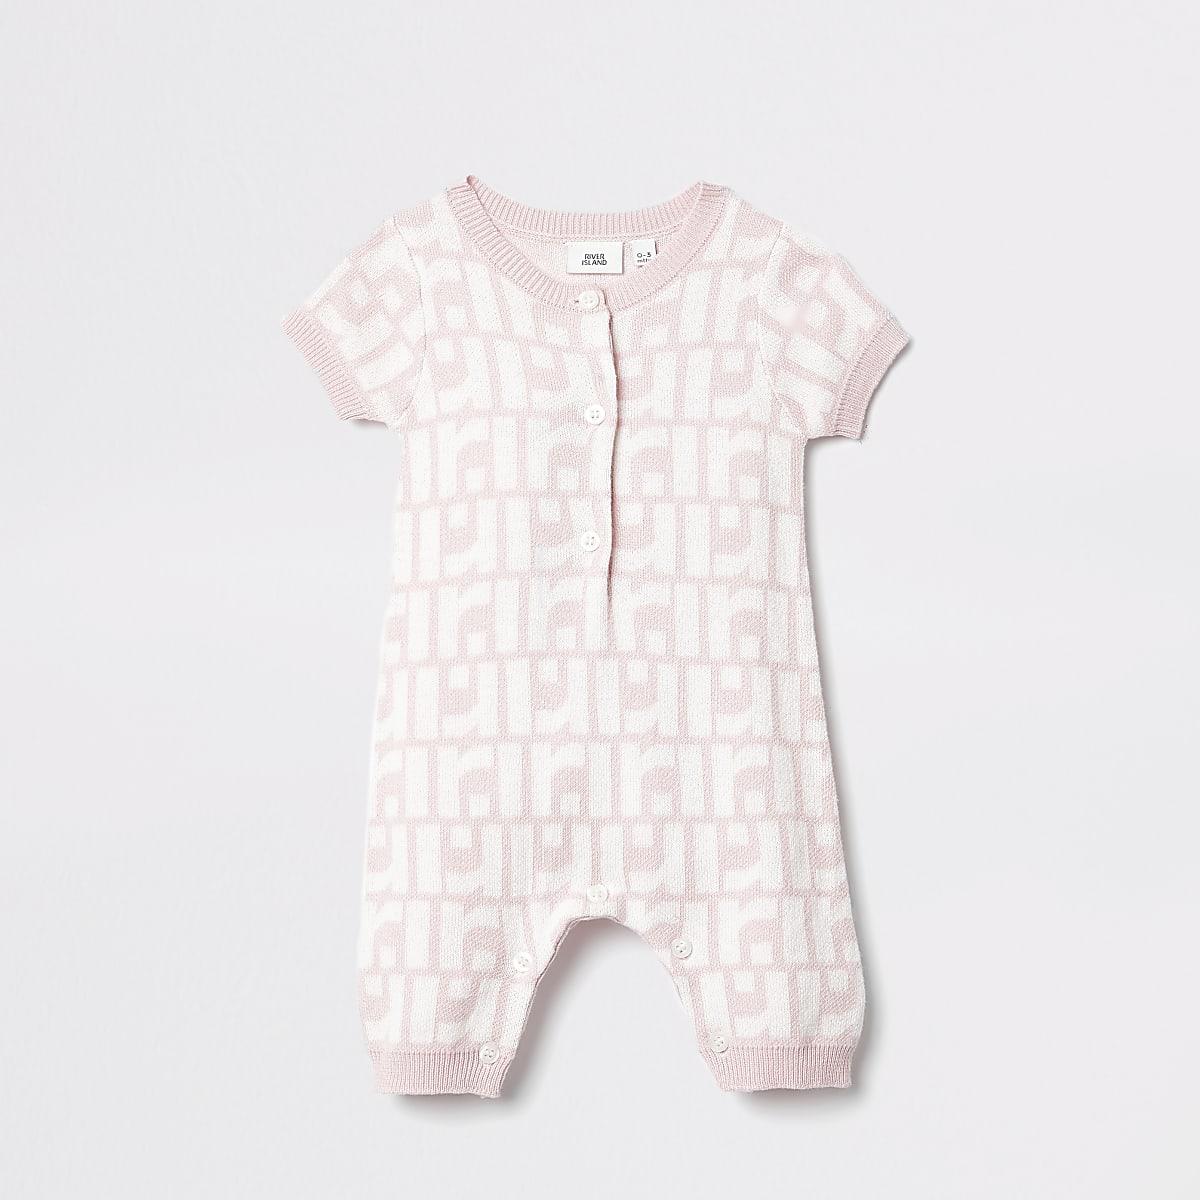 Baby pink RI monogram romper